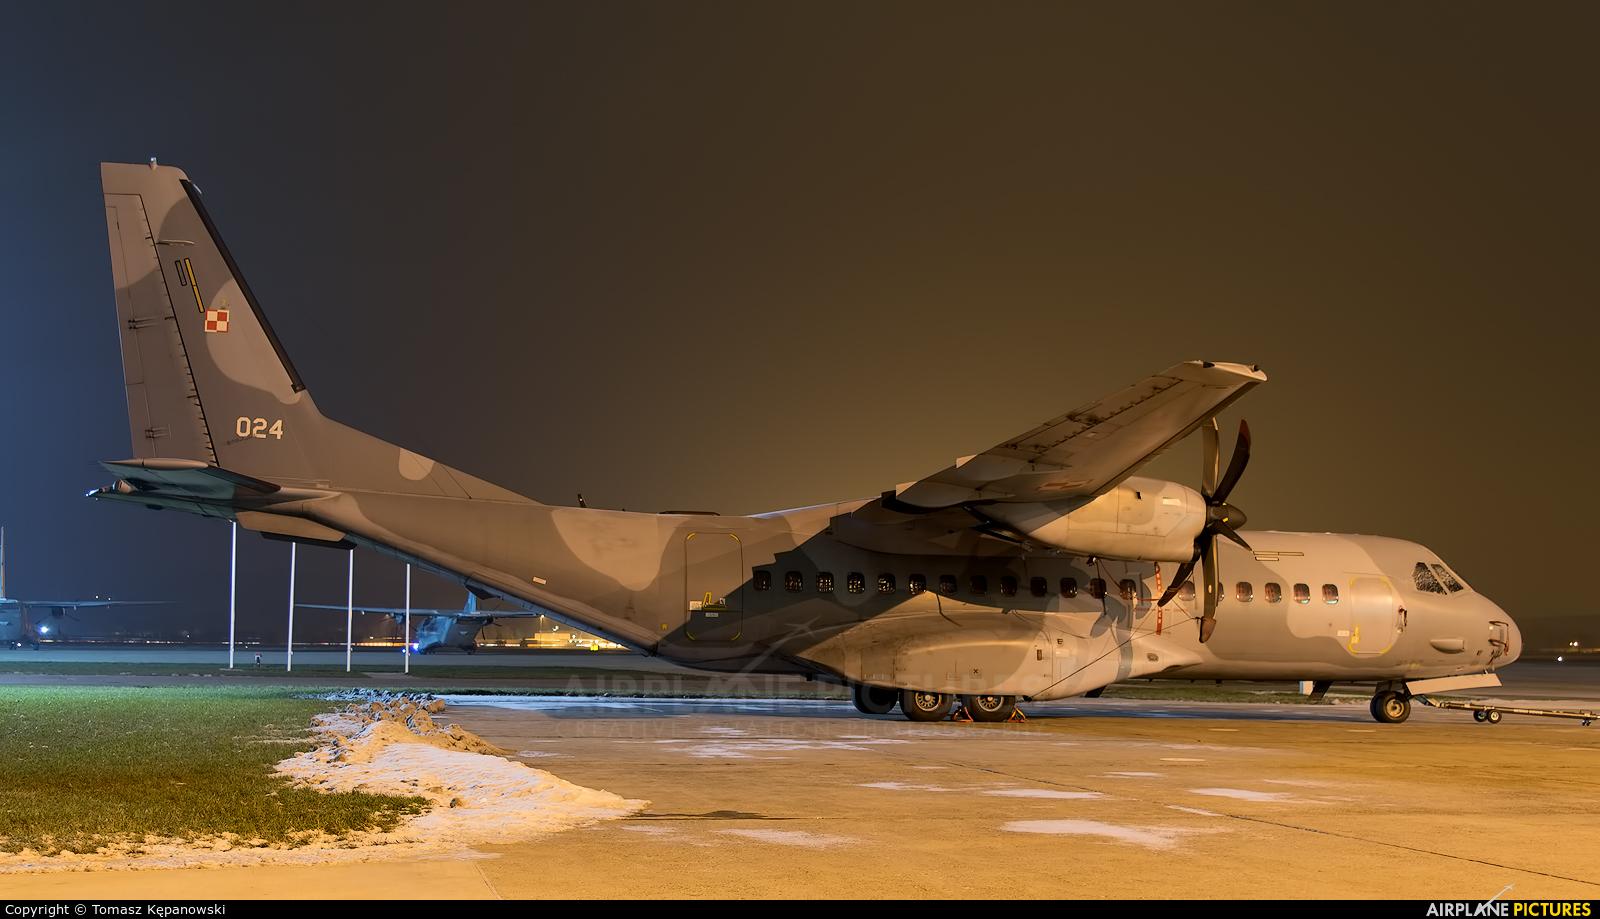 Poland - Air Force 024 aircraft at Kraków - John Paul II Intl